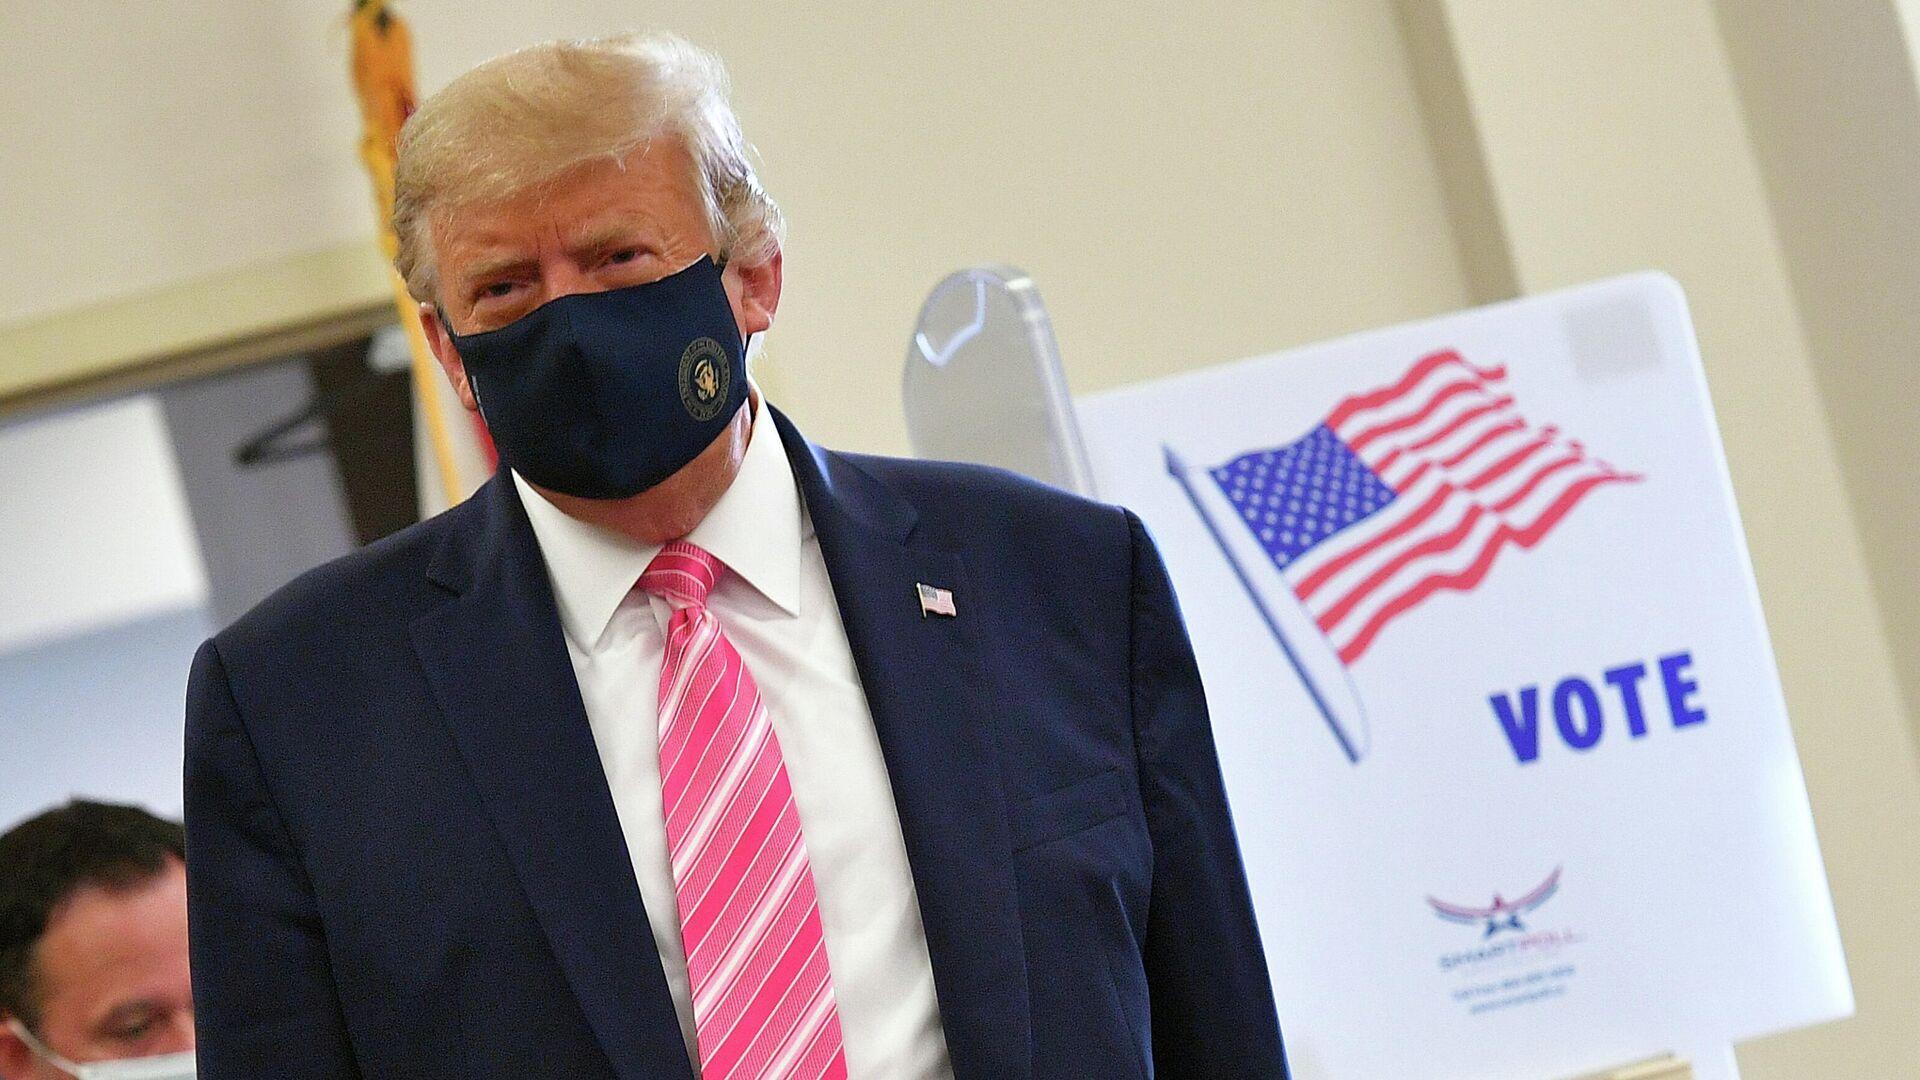 Трамп досрочно проголосовал на выборах президента США за самого себя